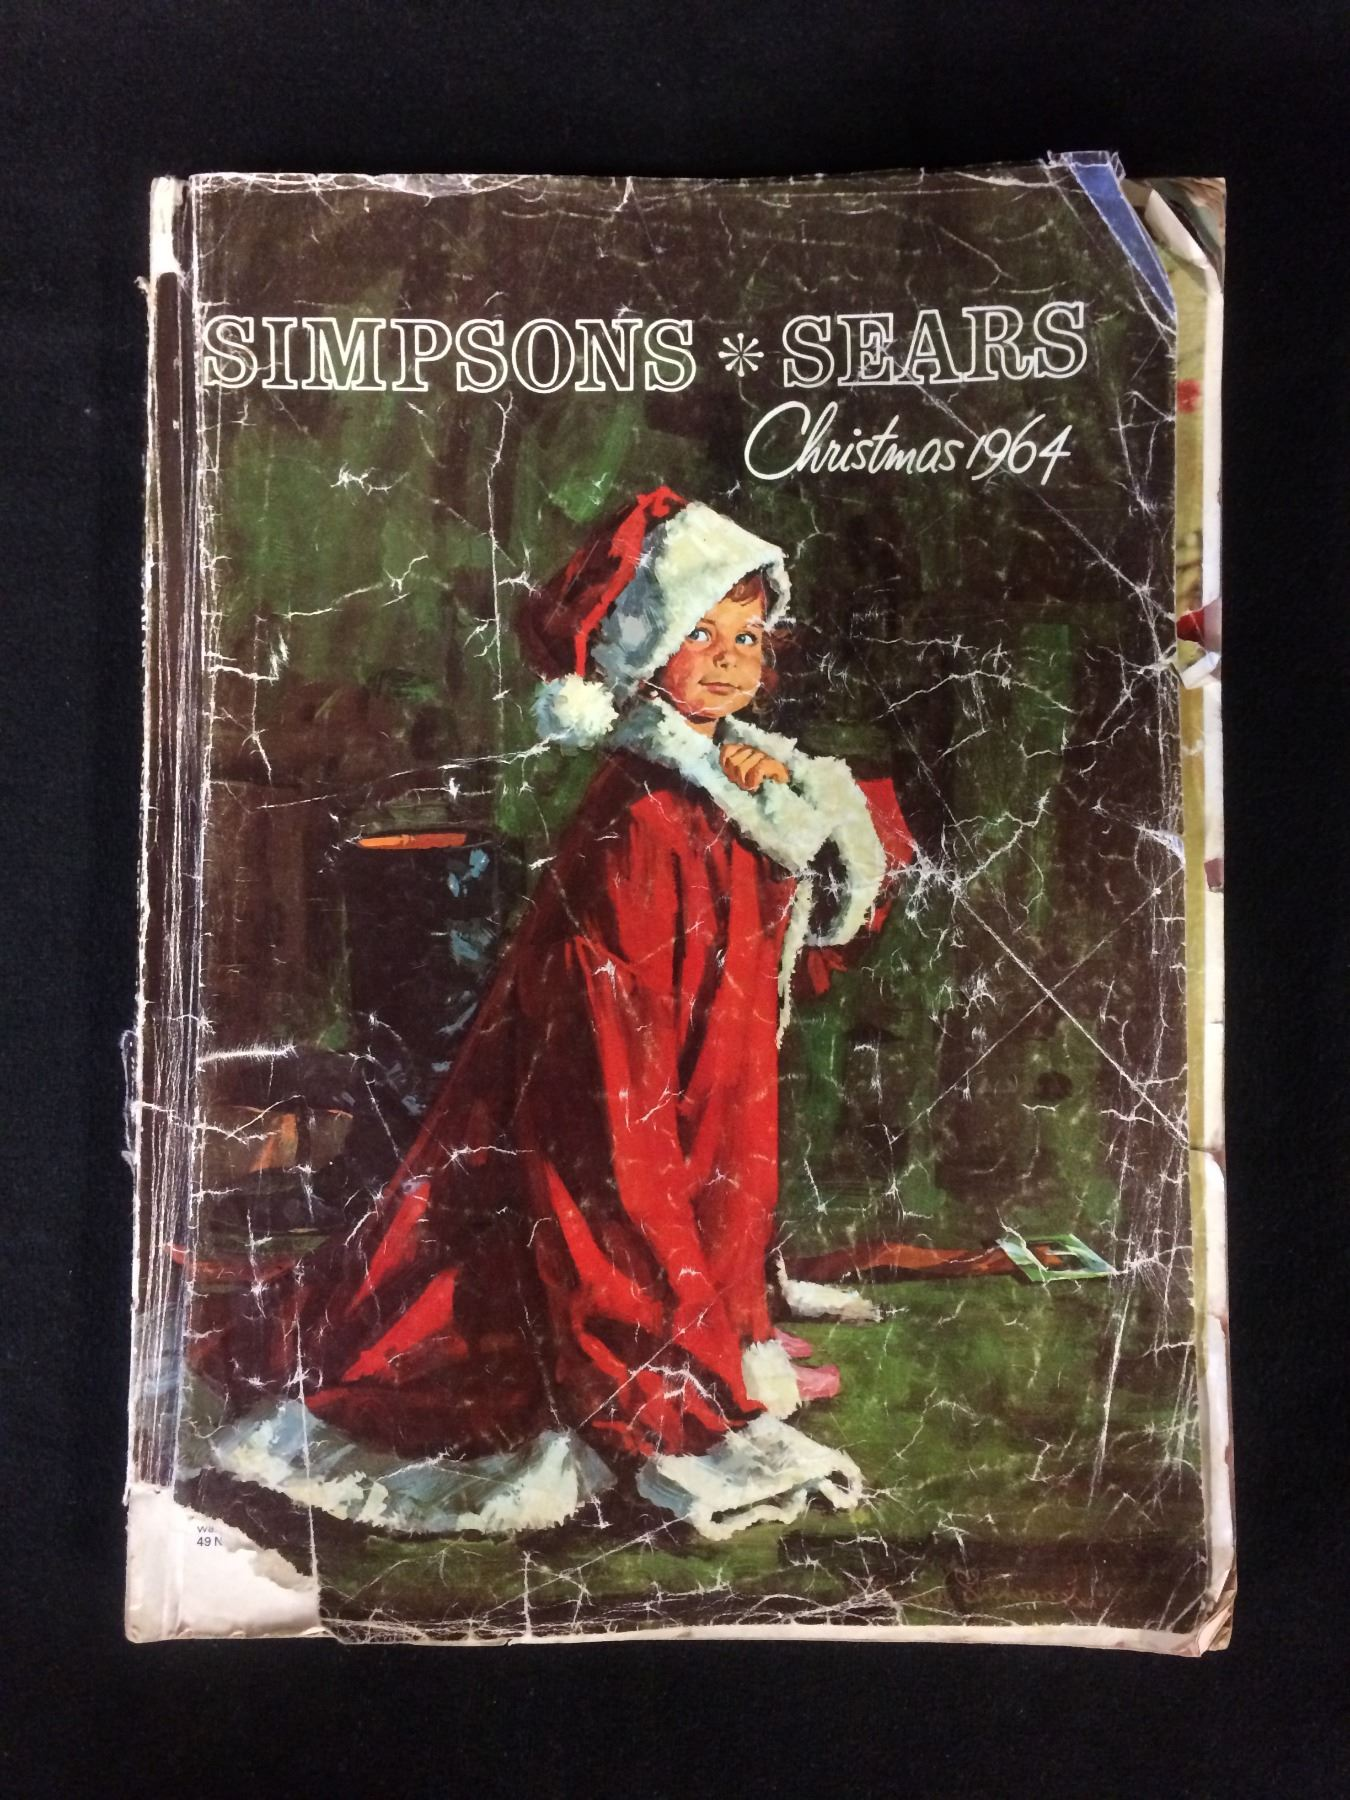 Sears Christmas Catalog.Vintage 1964 Simpsons Sears Christmas Catalogue